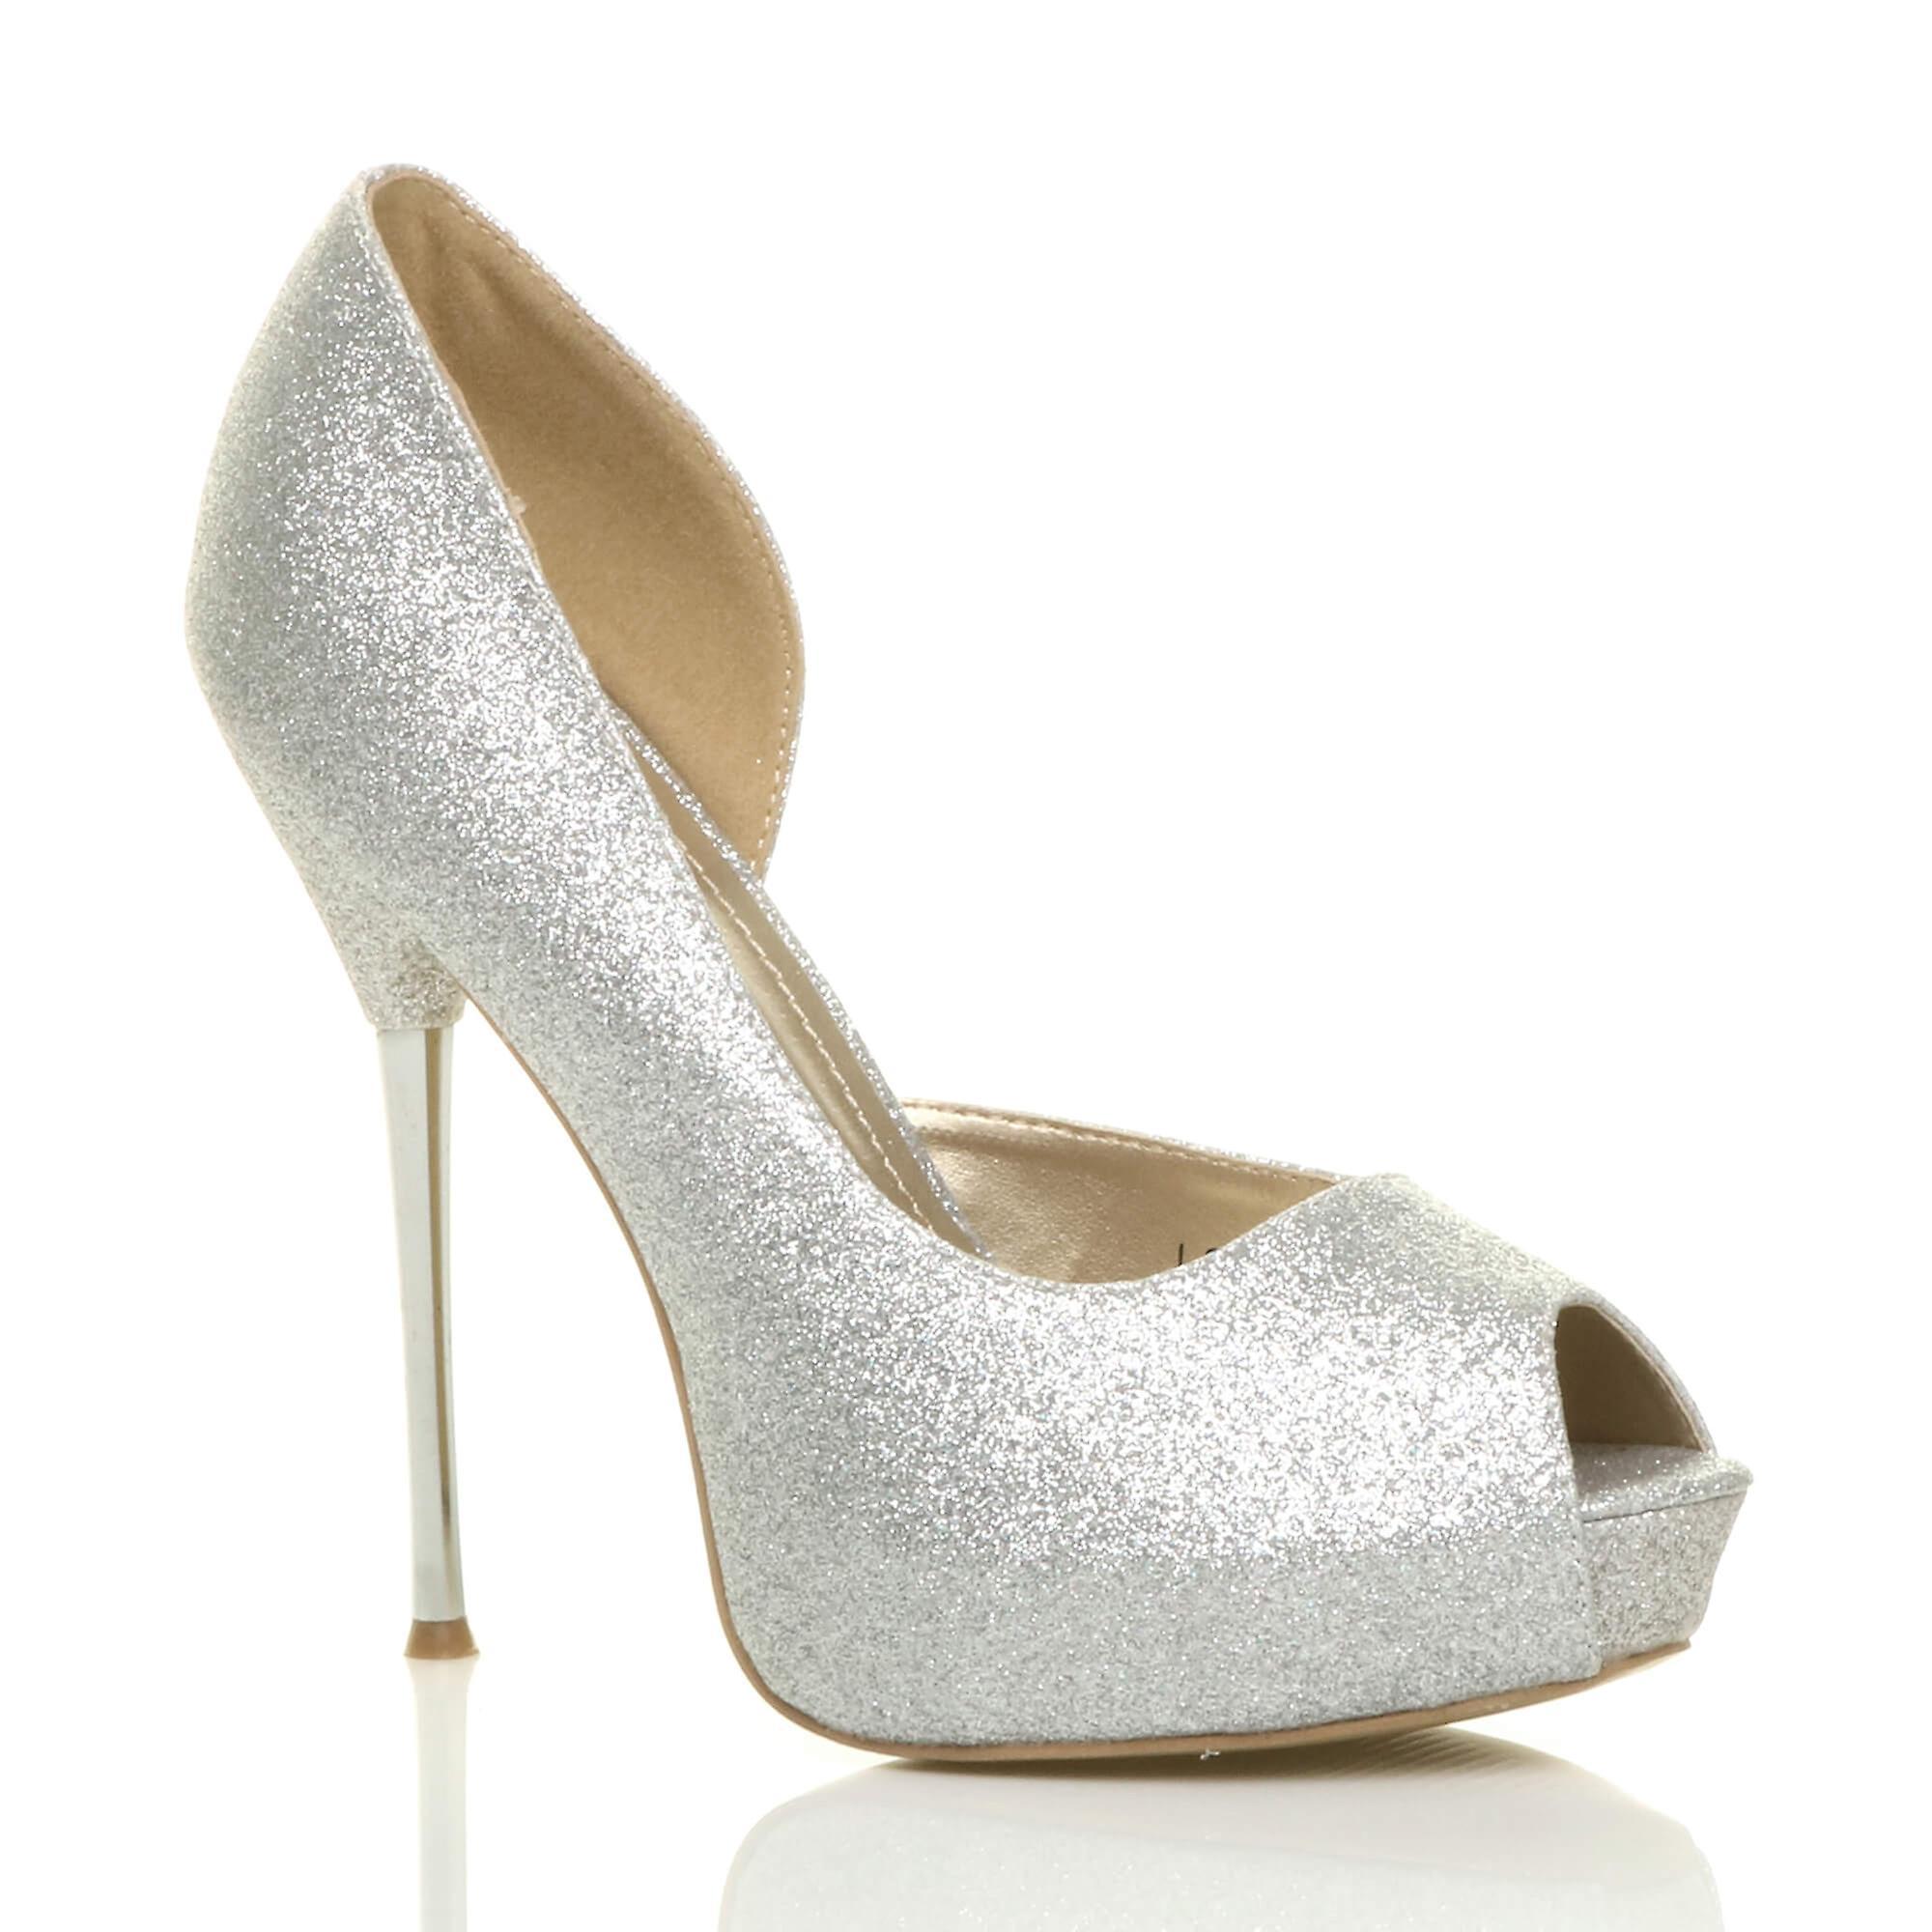 glitter pumps womens shoes party prom stiletto platform heel sandals wedding high Ajvani PCOnqRIq